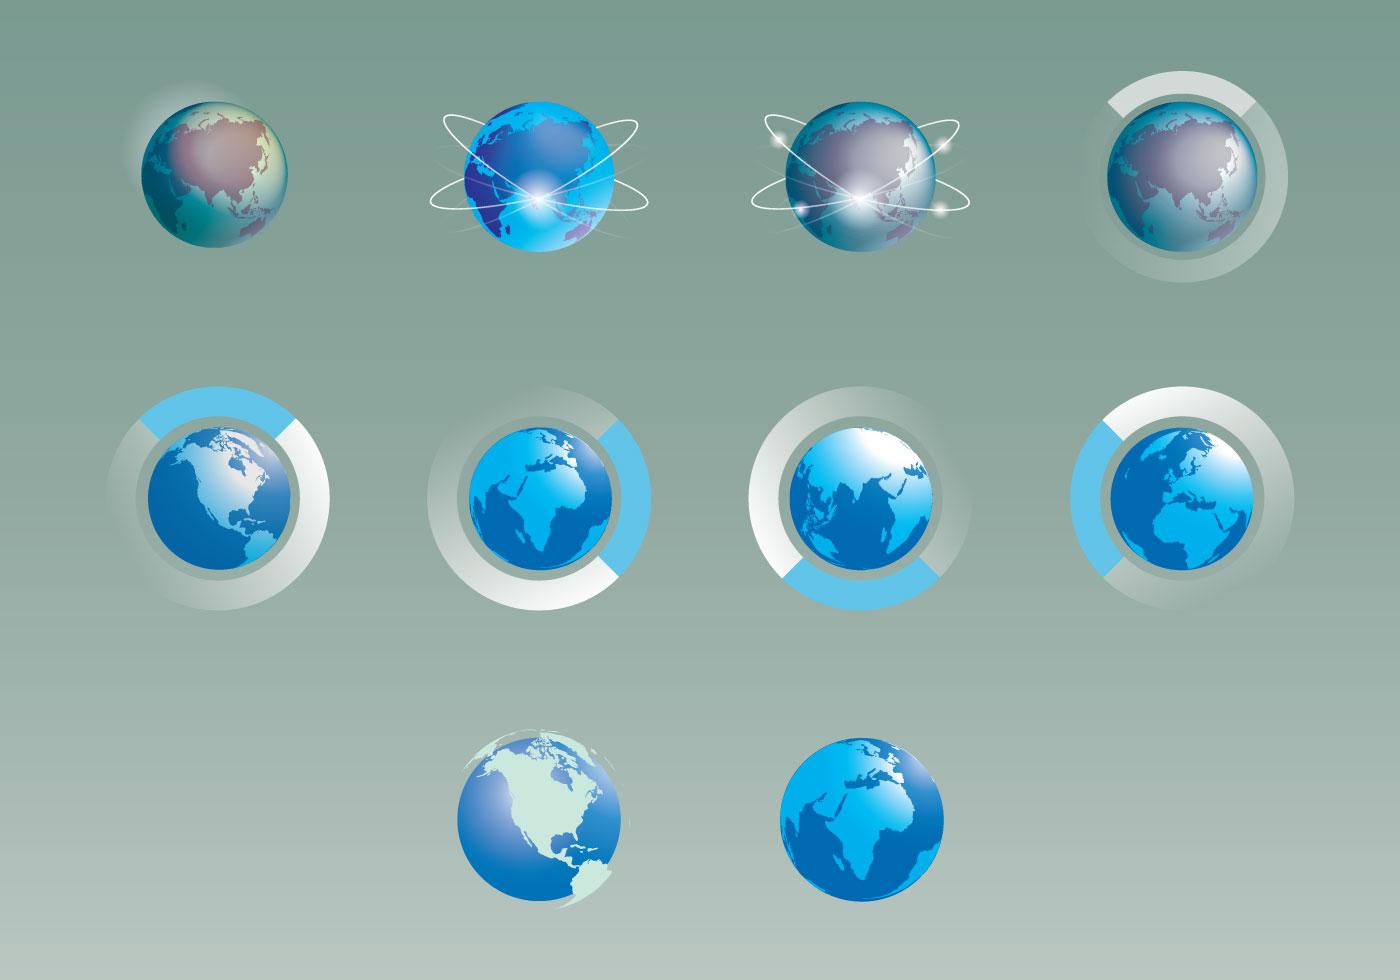 world map infographic icon set